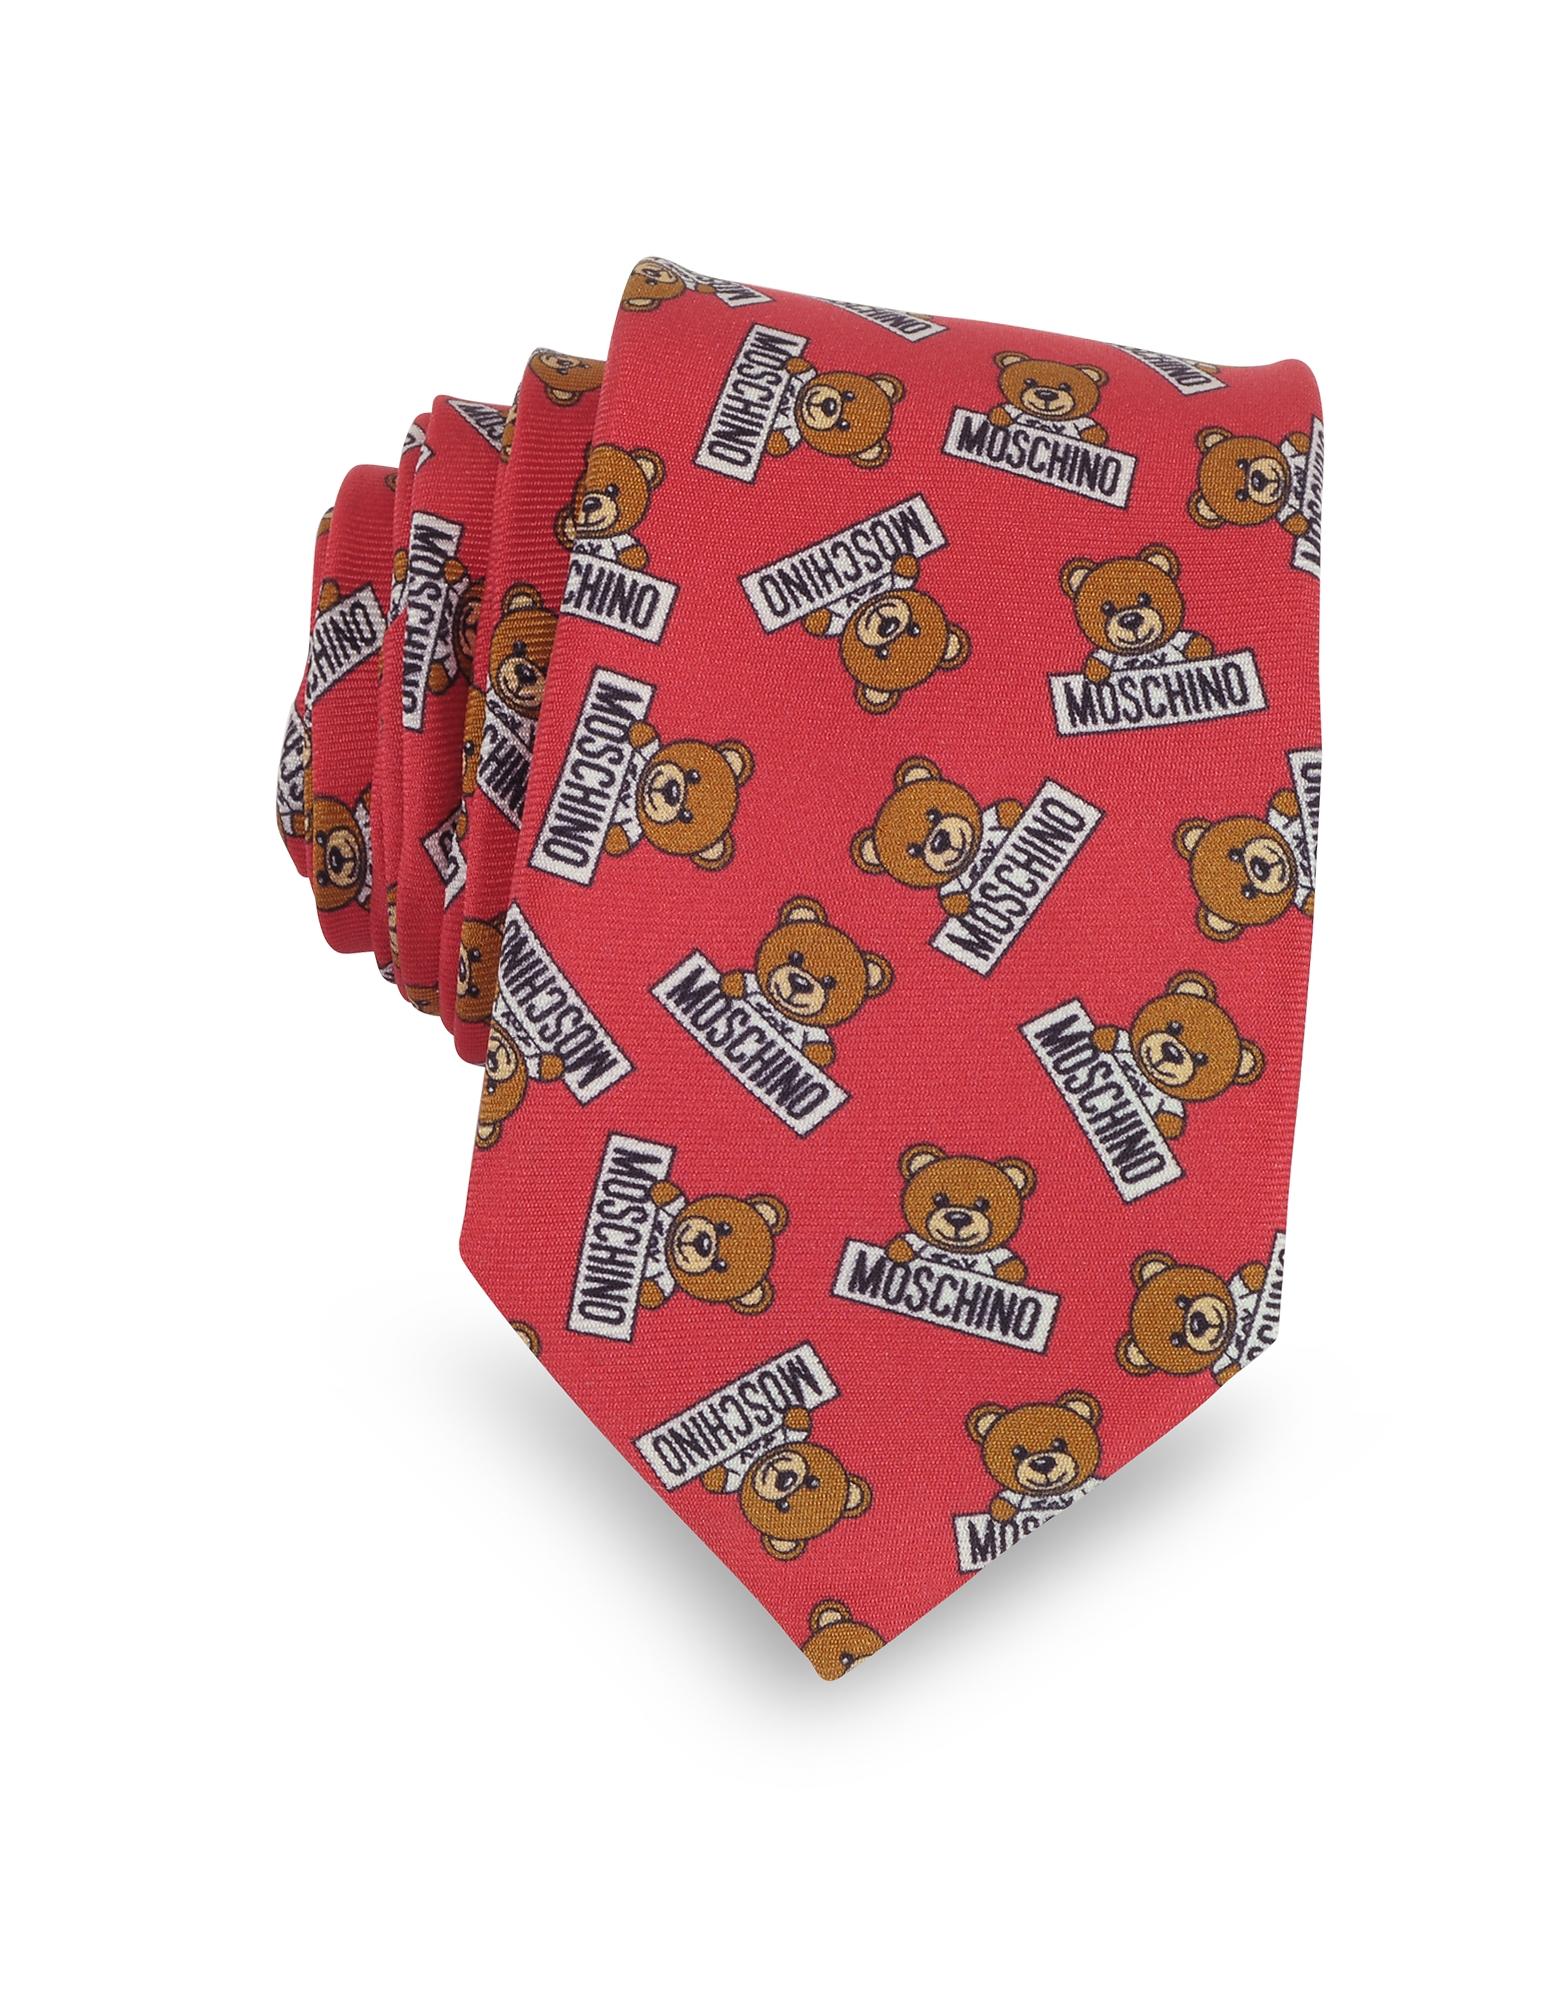 Moschino Ties, Teddy Bear All Over Printed Silk Narrow Tie